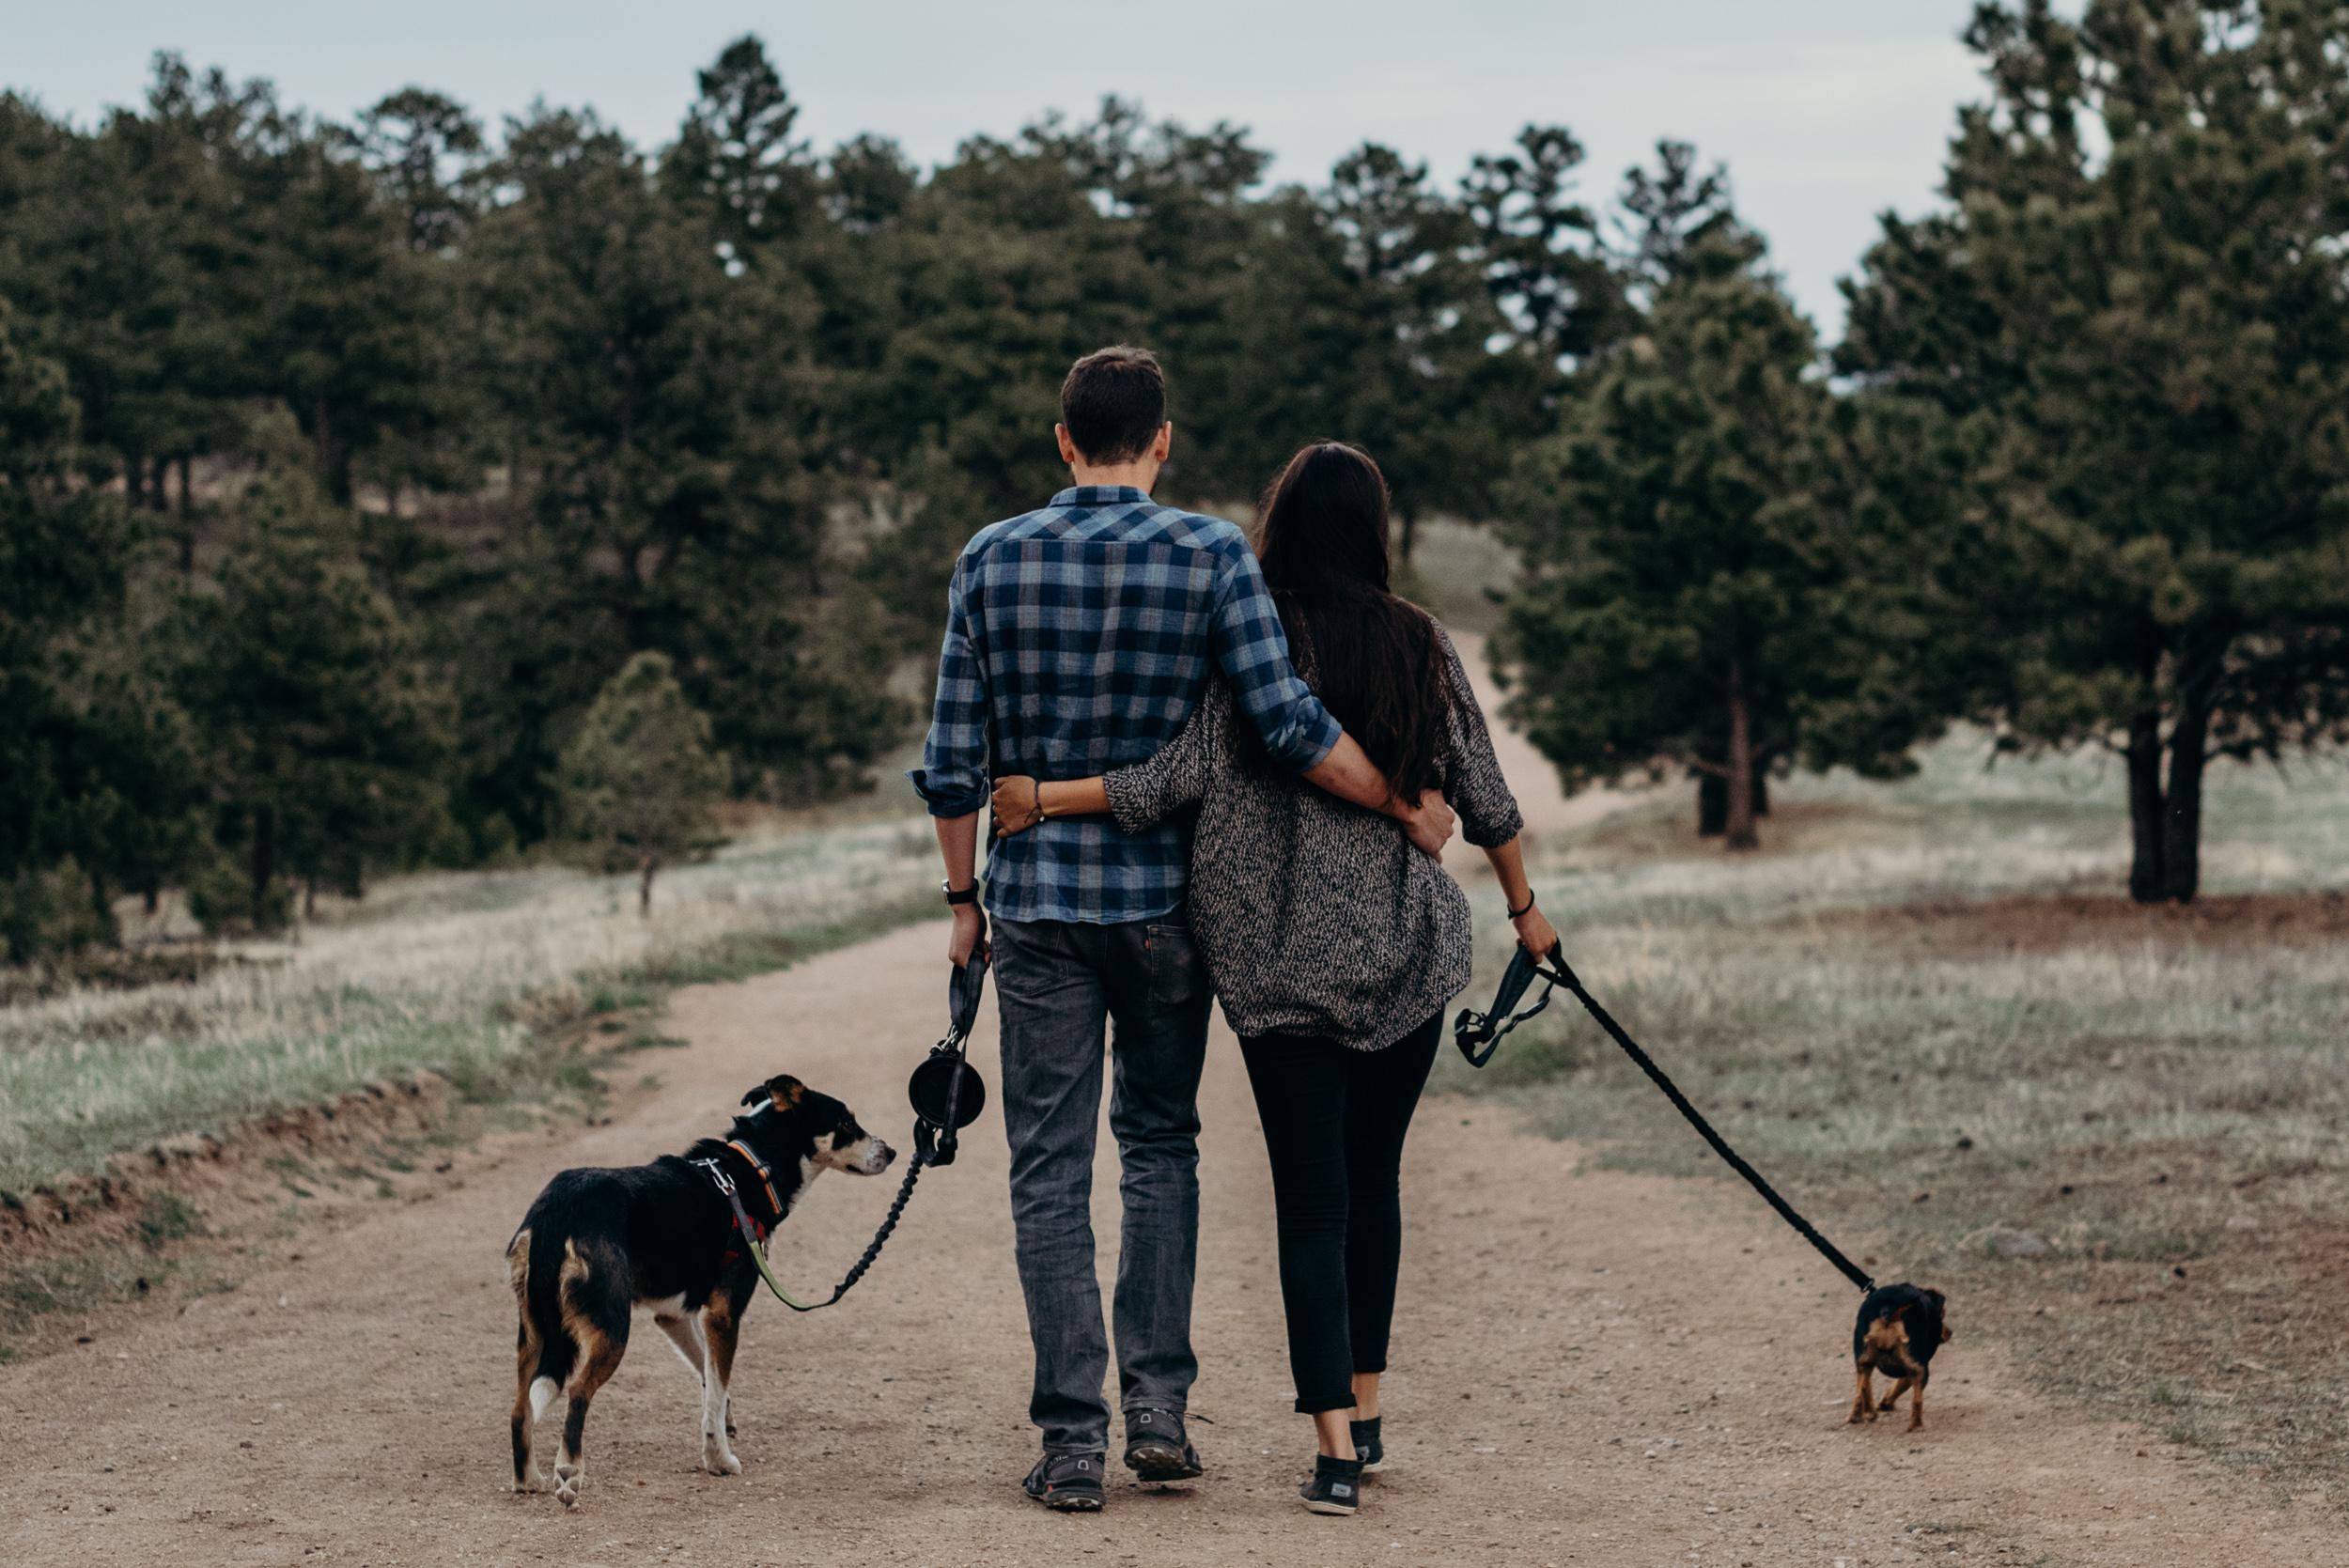 Denver-Colorado-Mt-Falcon-Engagement-Megan-Graham-Photography-7154.jpg